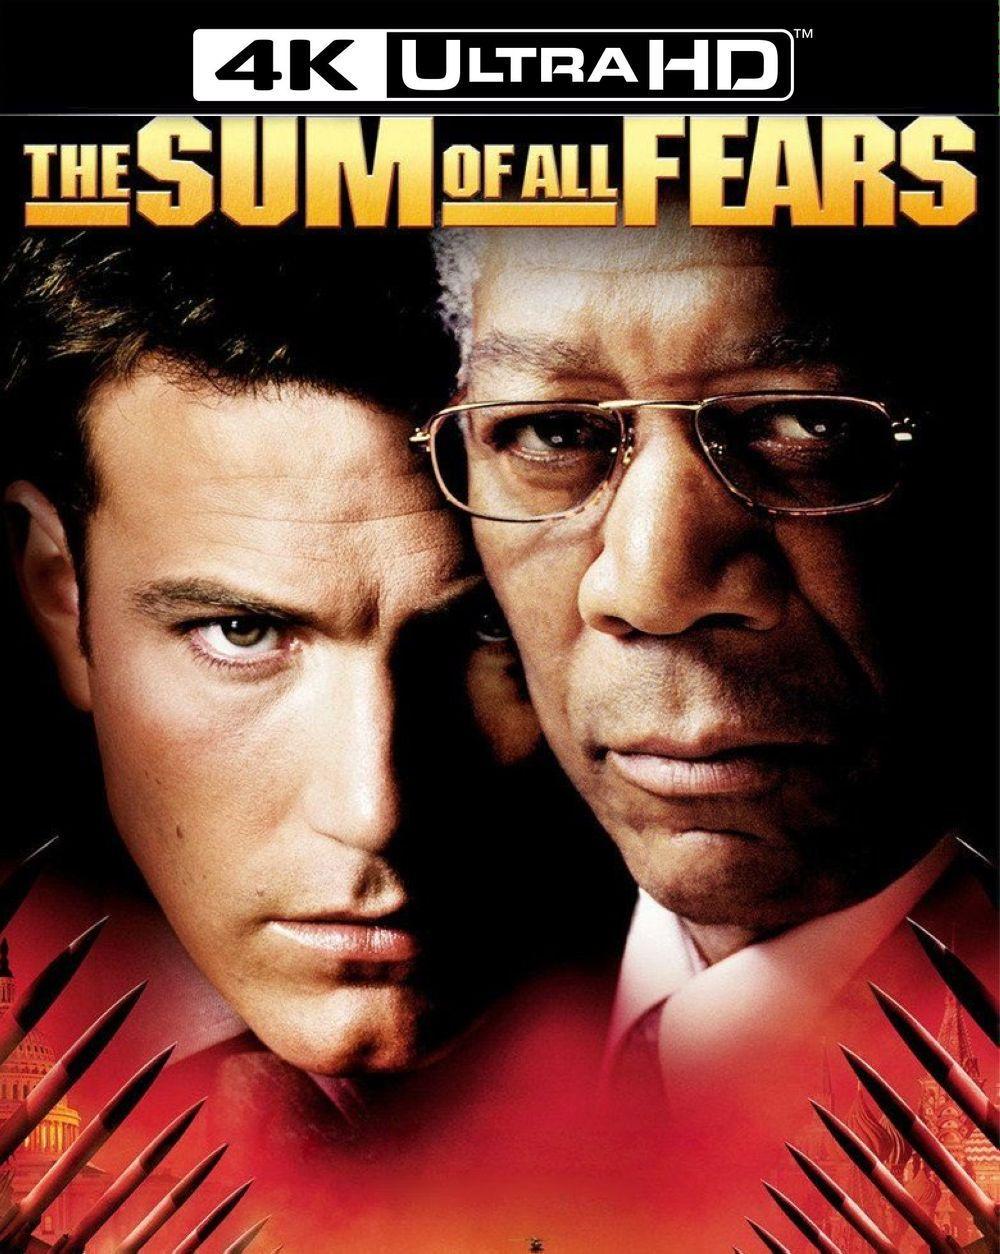 Цена страха (4K UHD Blu-ray) Mace Neufeld Productions,Paramount Pictures